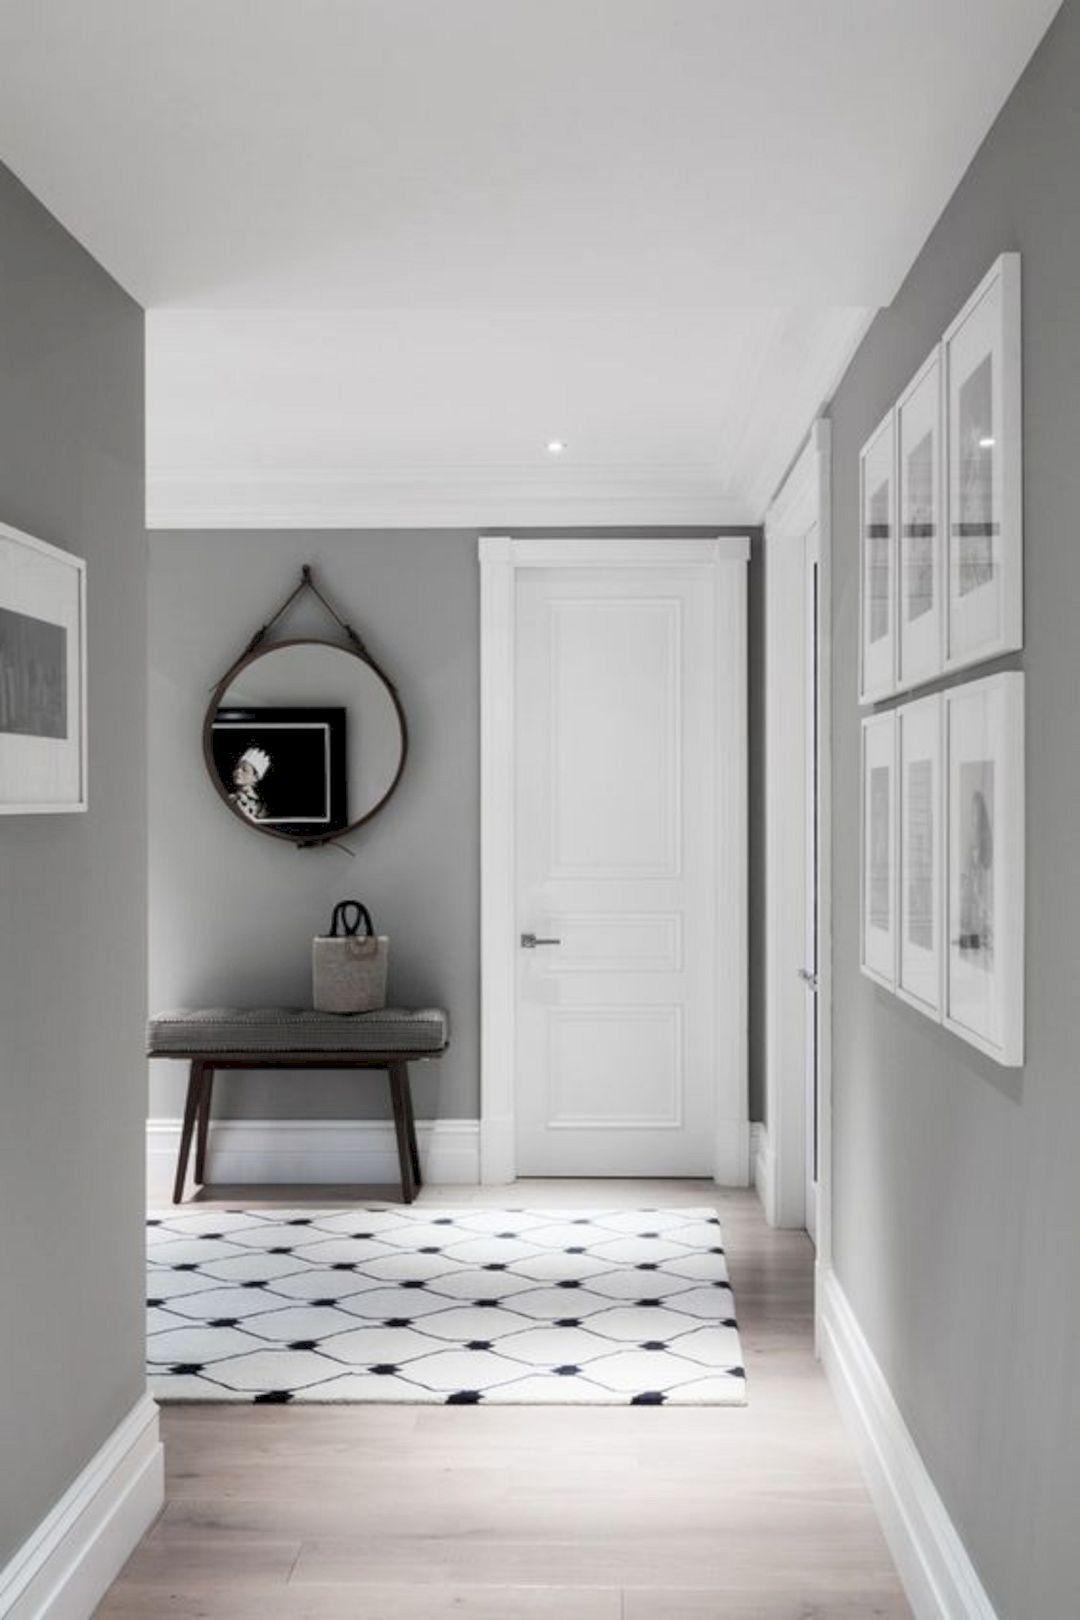 Charmant 16 Interior Design Ideas With Grey Walls  Https://www.futuristarchitecture.com/30850 Grey Walls.html